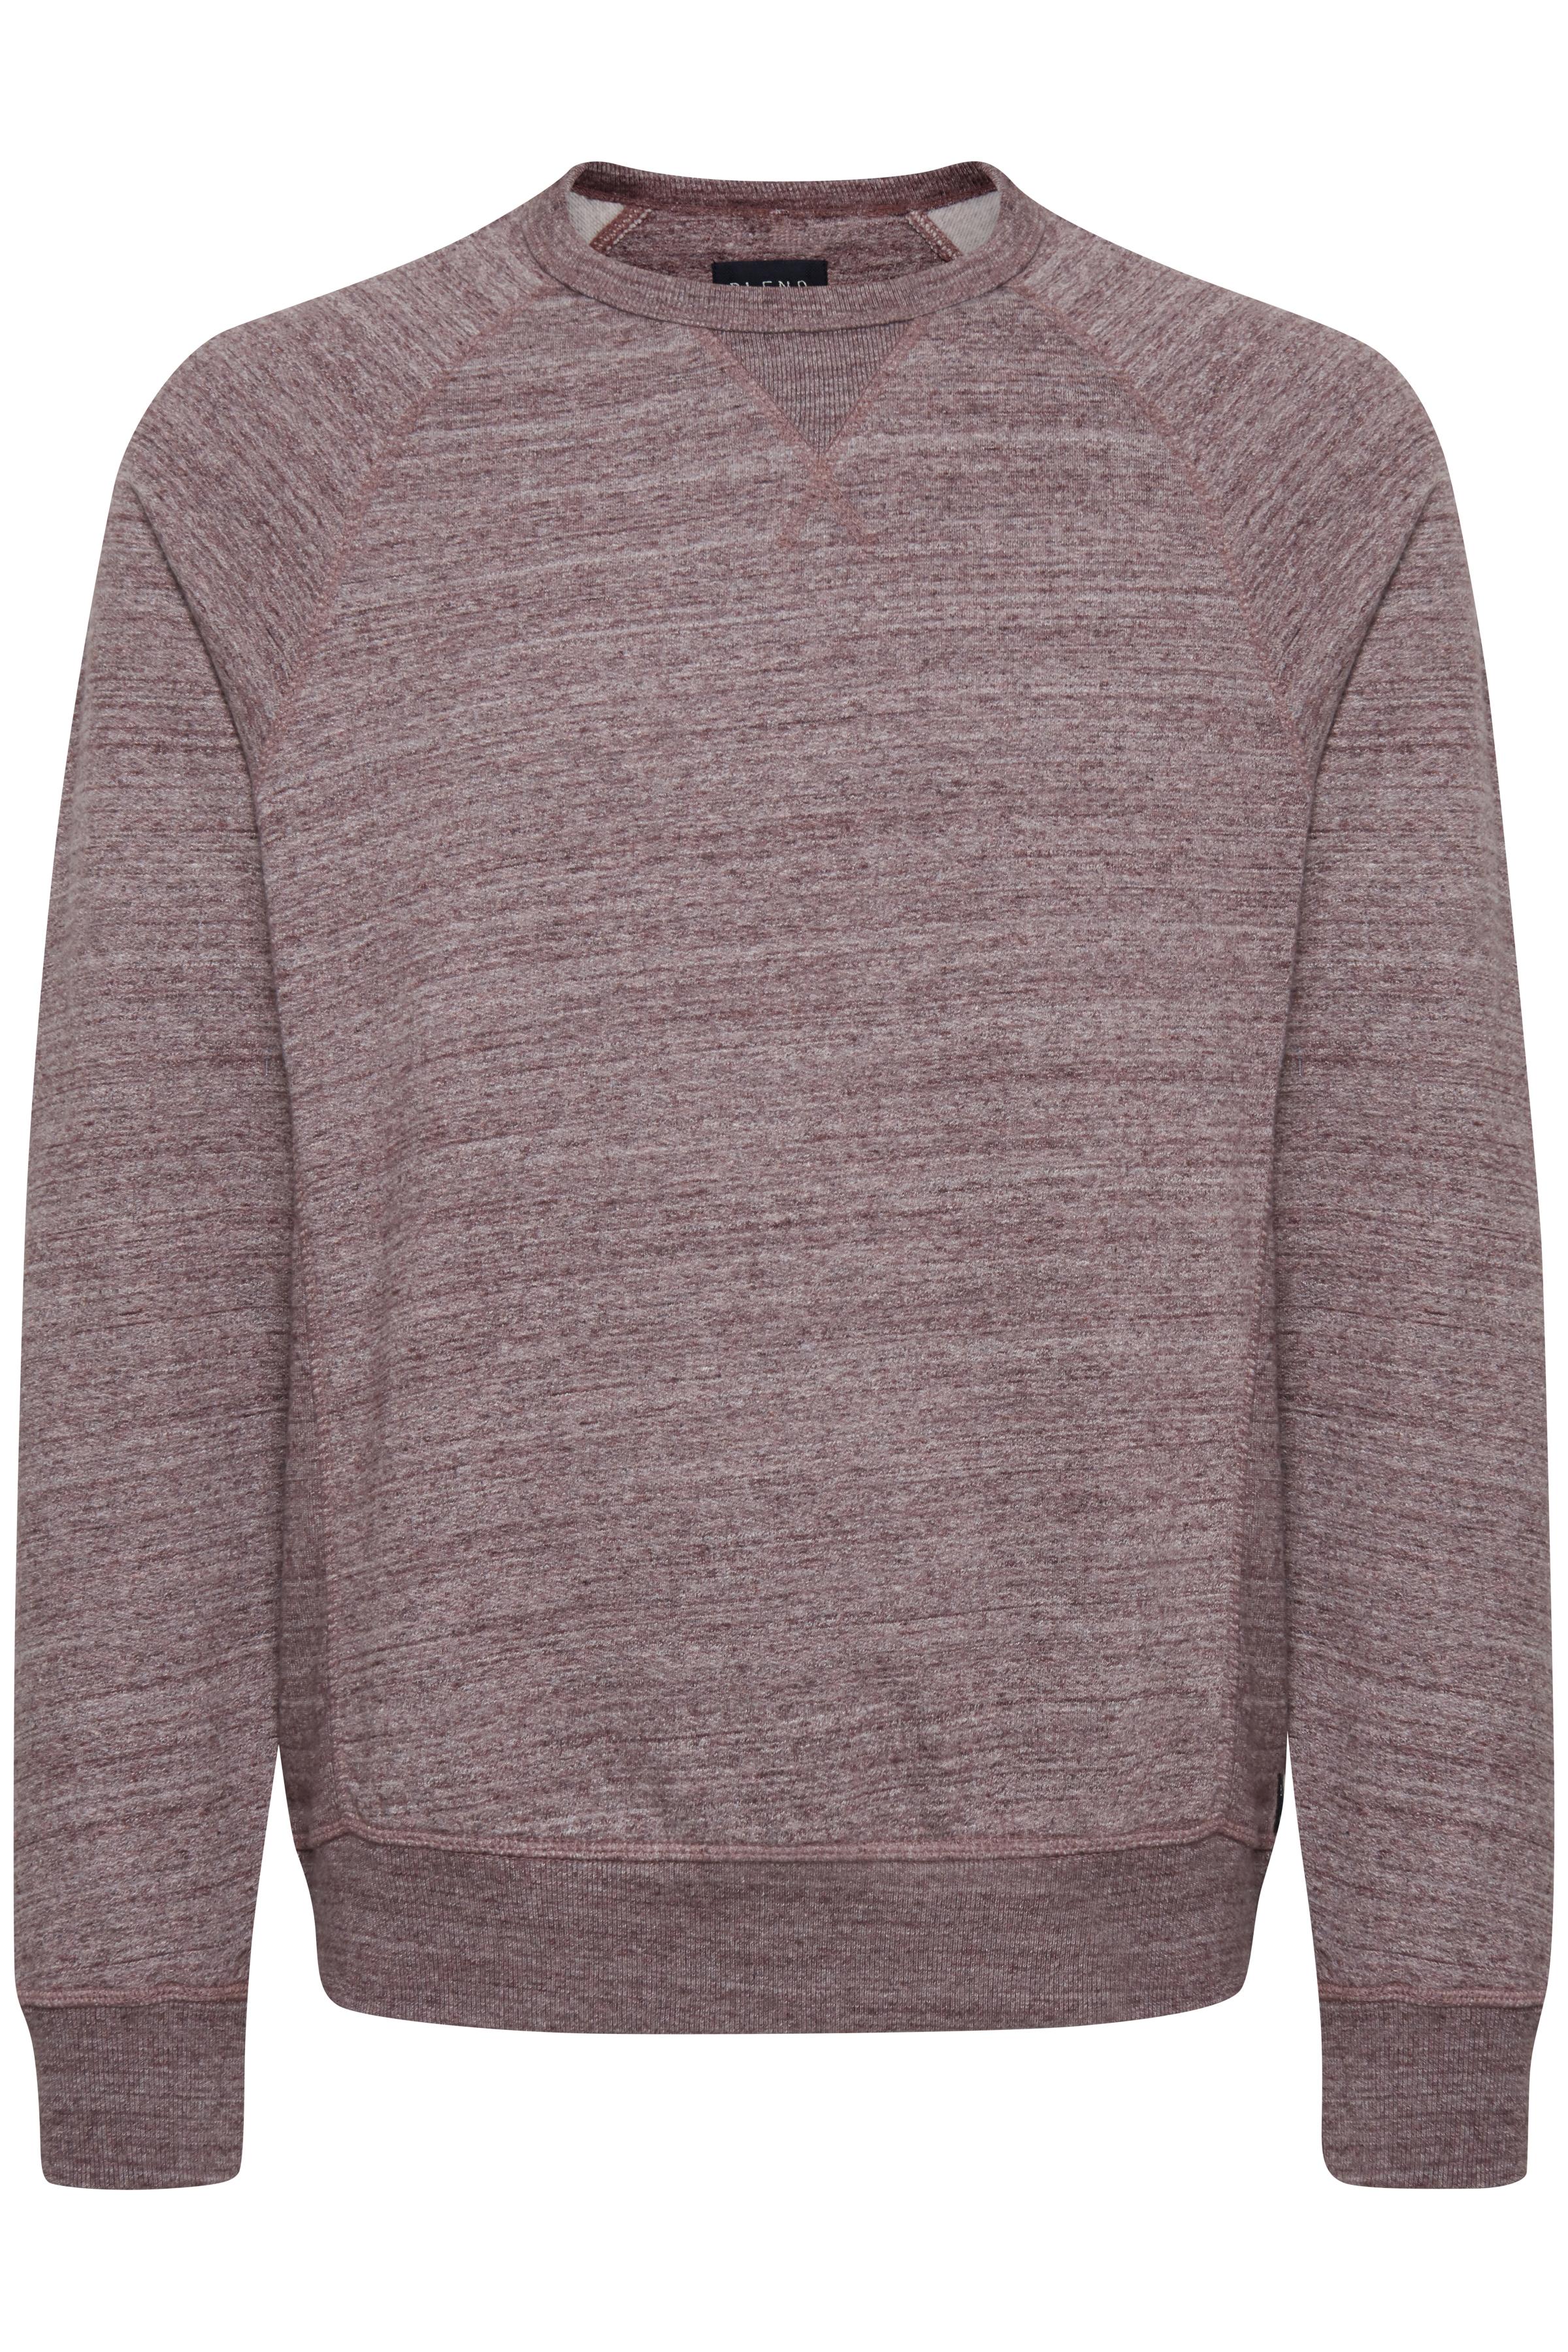 Blend He Herre Cool sweatshirt - Bordeaux